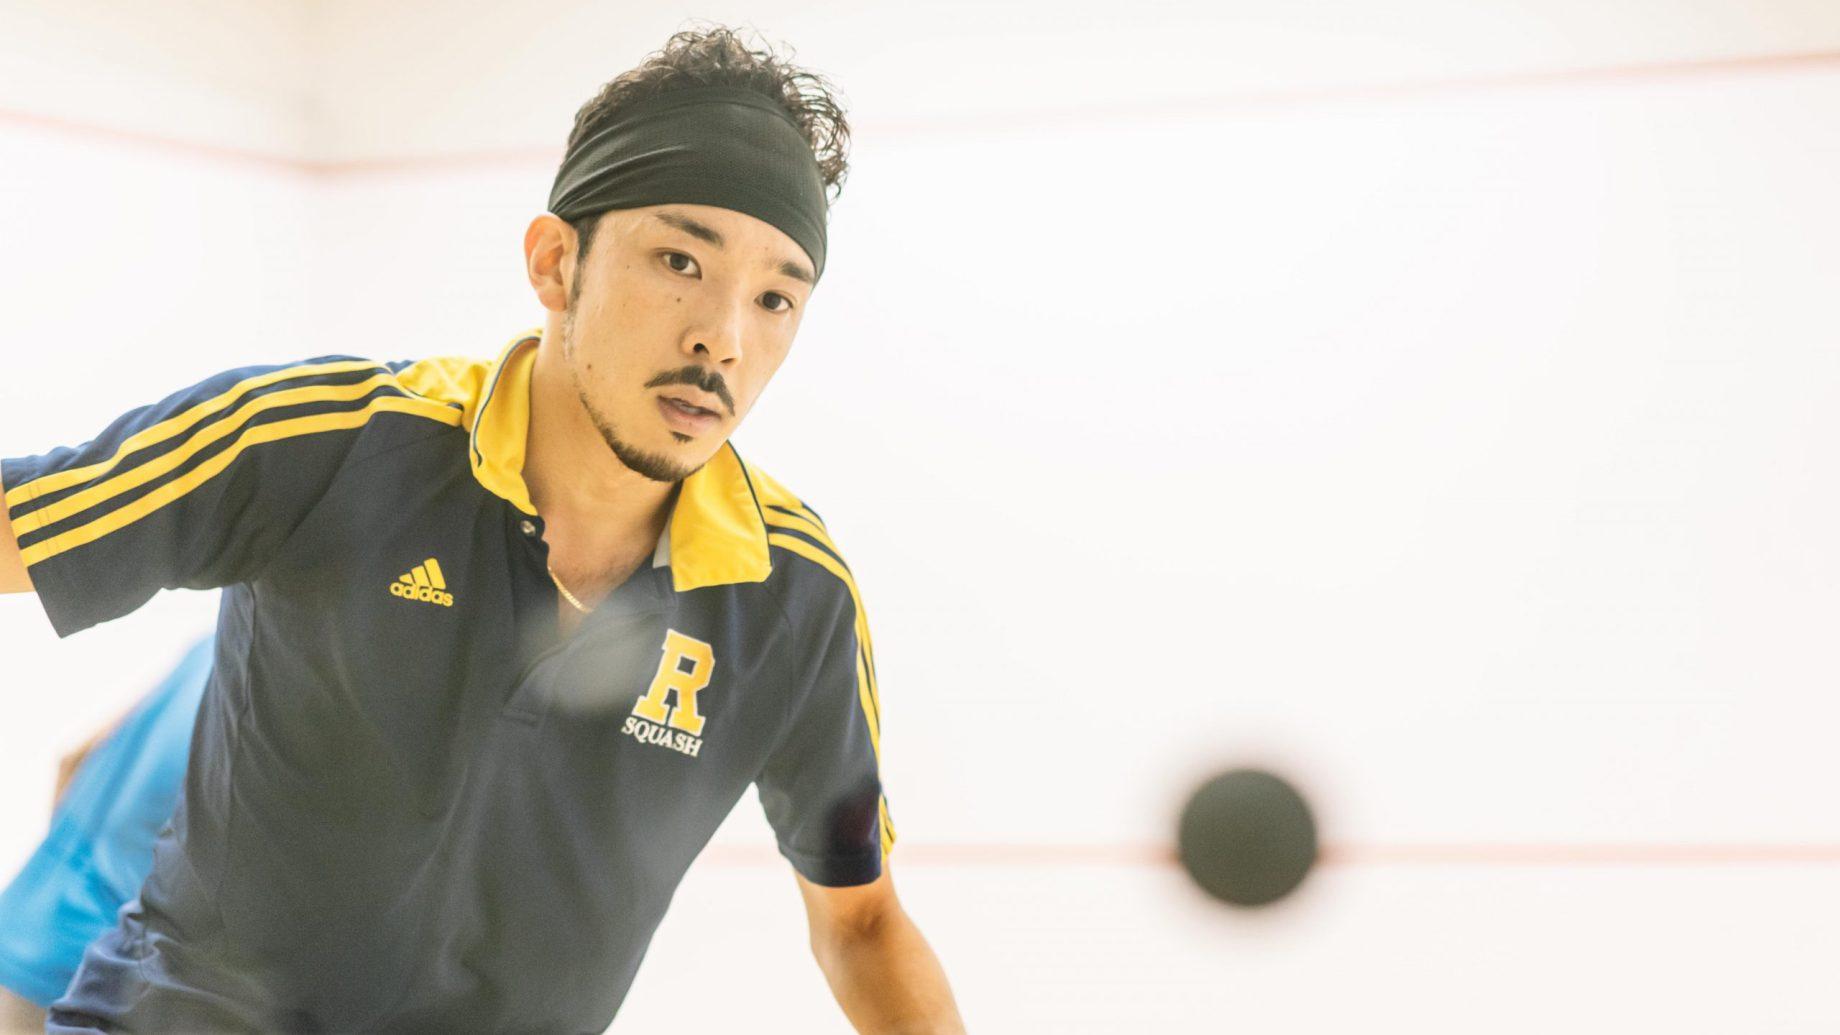 Ryosei Kobayashi